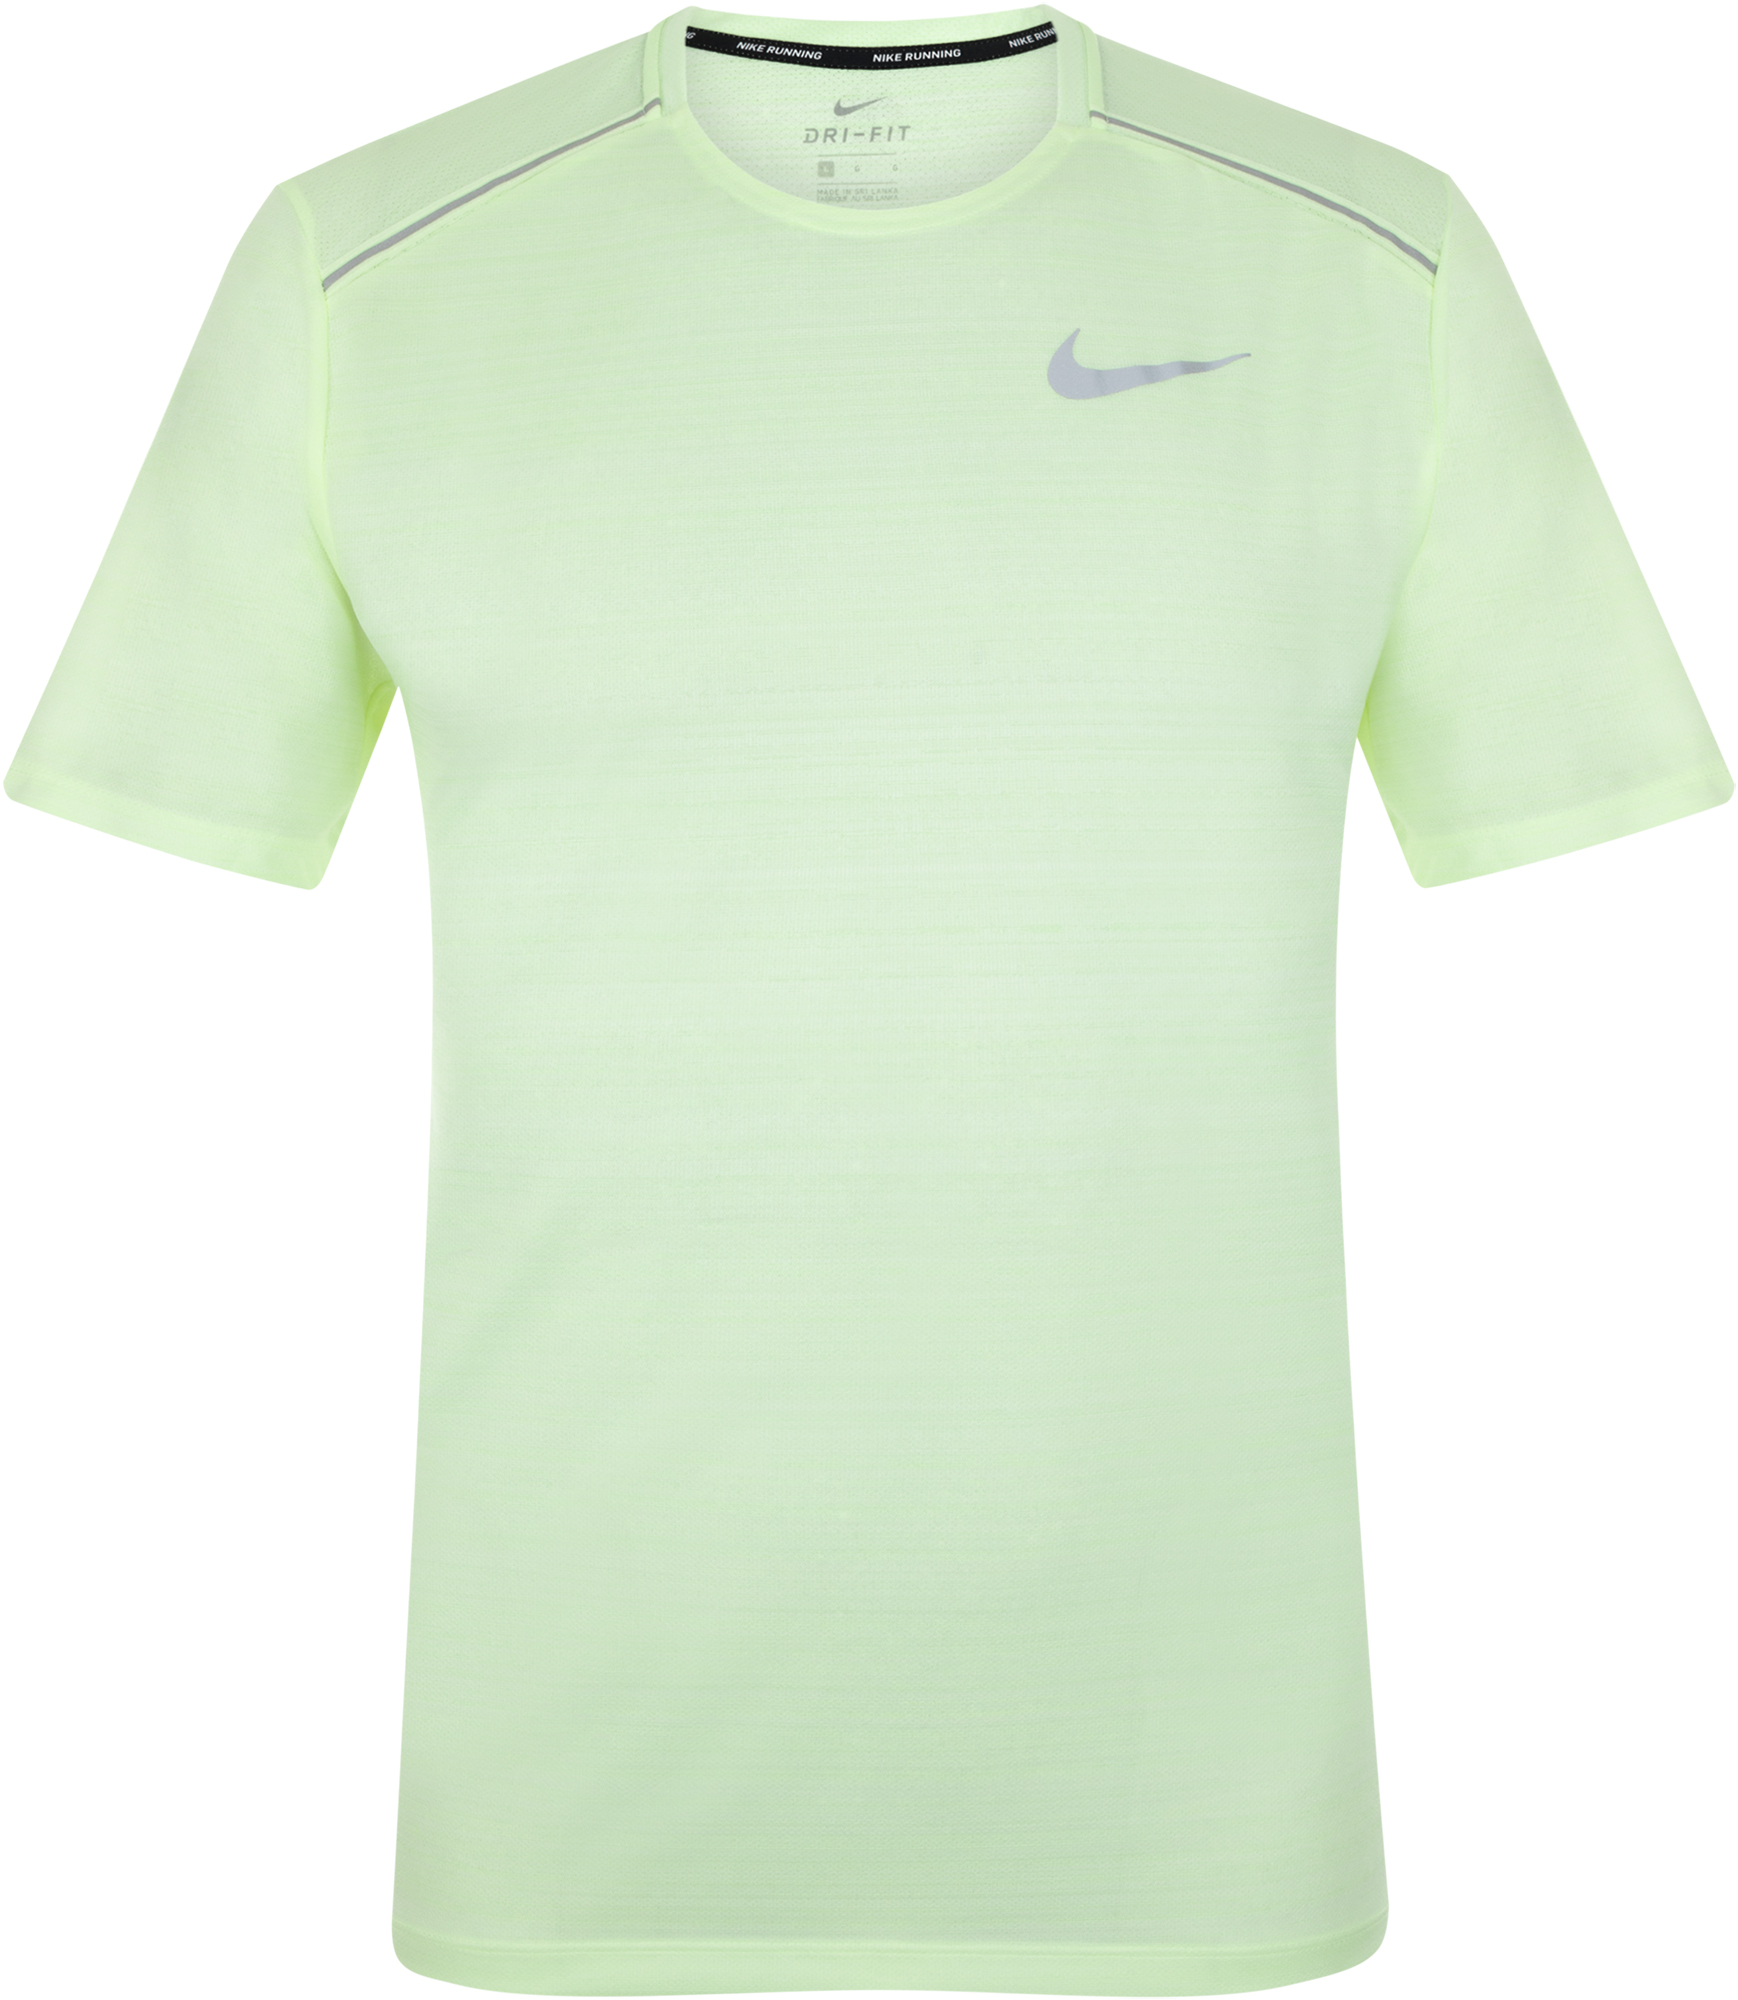 Nike Футболка мужская Nike Dry Miler, размер 50-52 nike футболка мужская nike cool miler